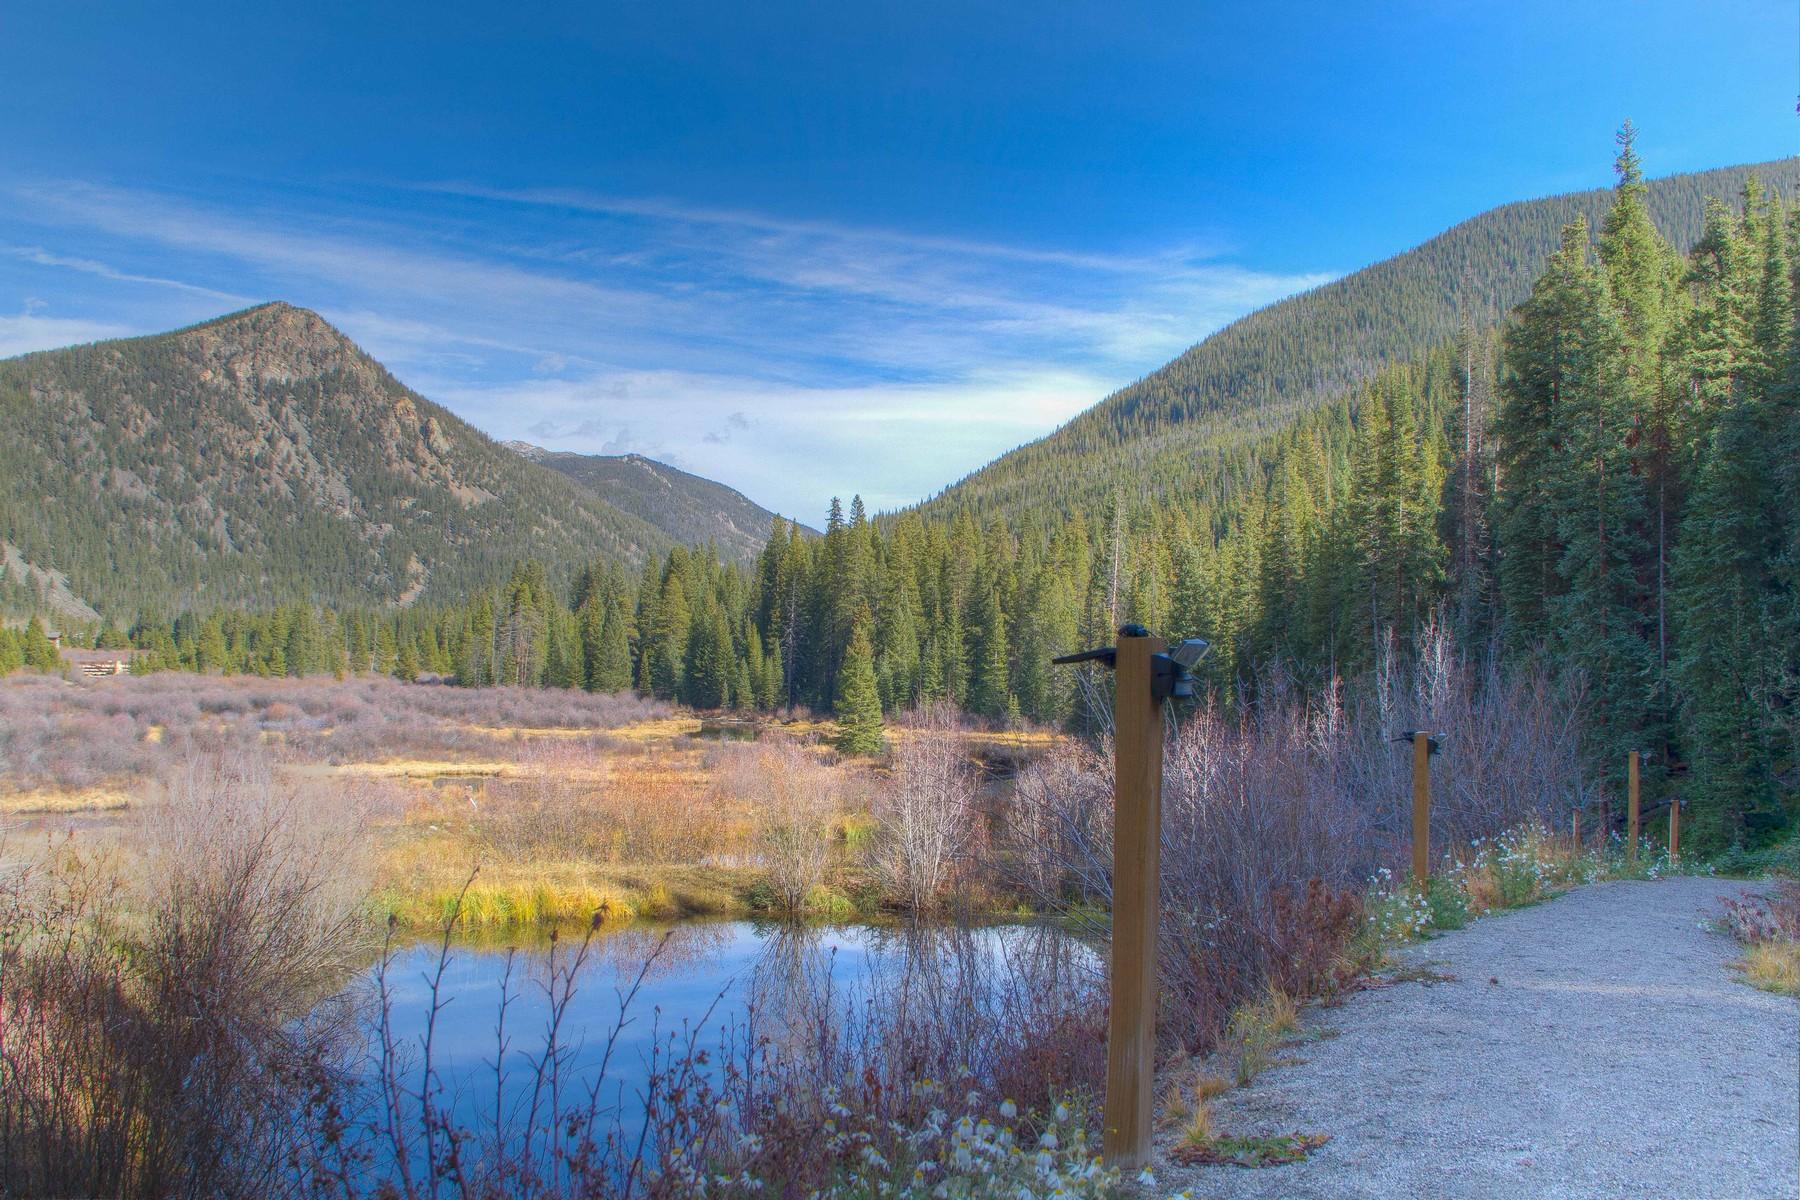 Land for Sale at Lot 12 at Dercum's Dash 112 E. Trade Ct, Lot 12 Keystone, Colorado, 80435 United States